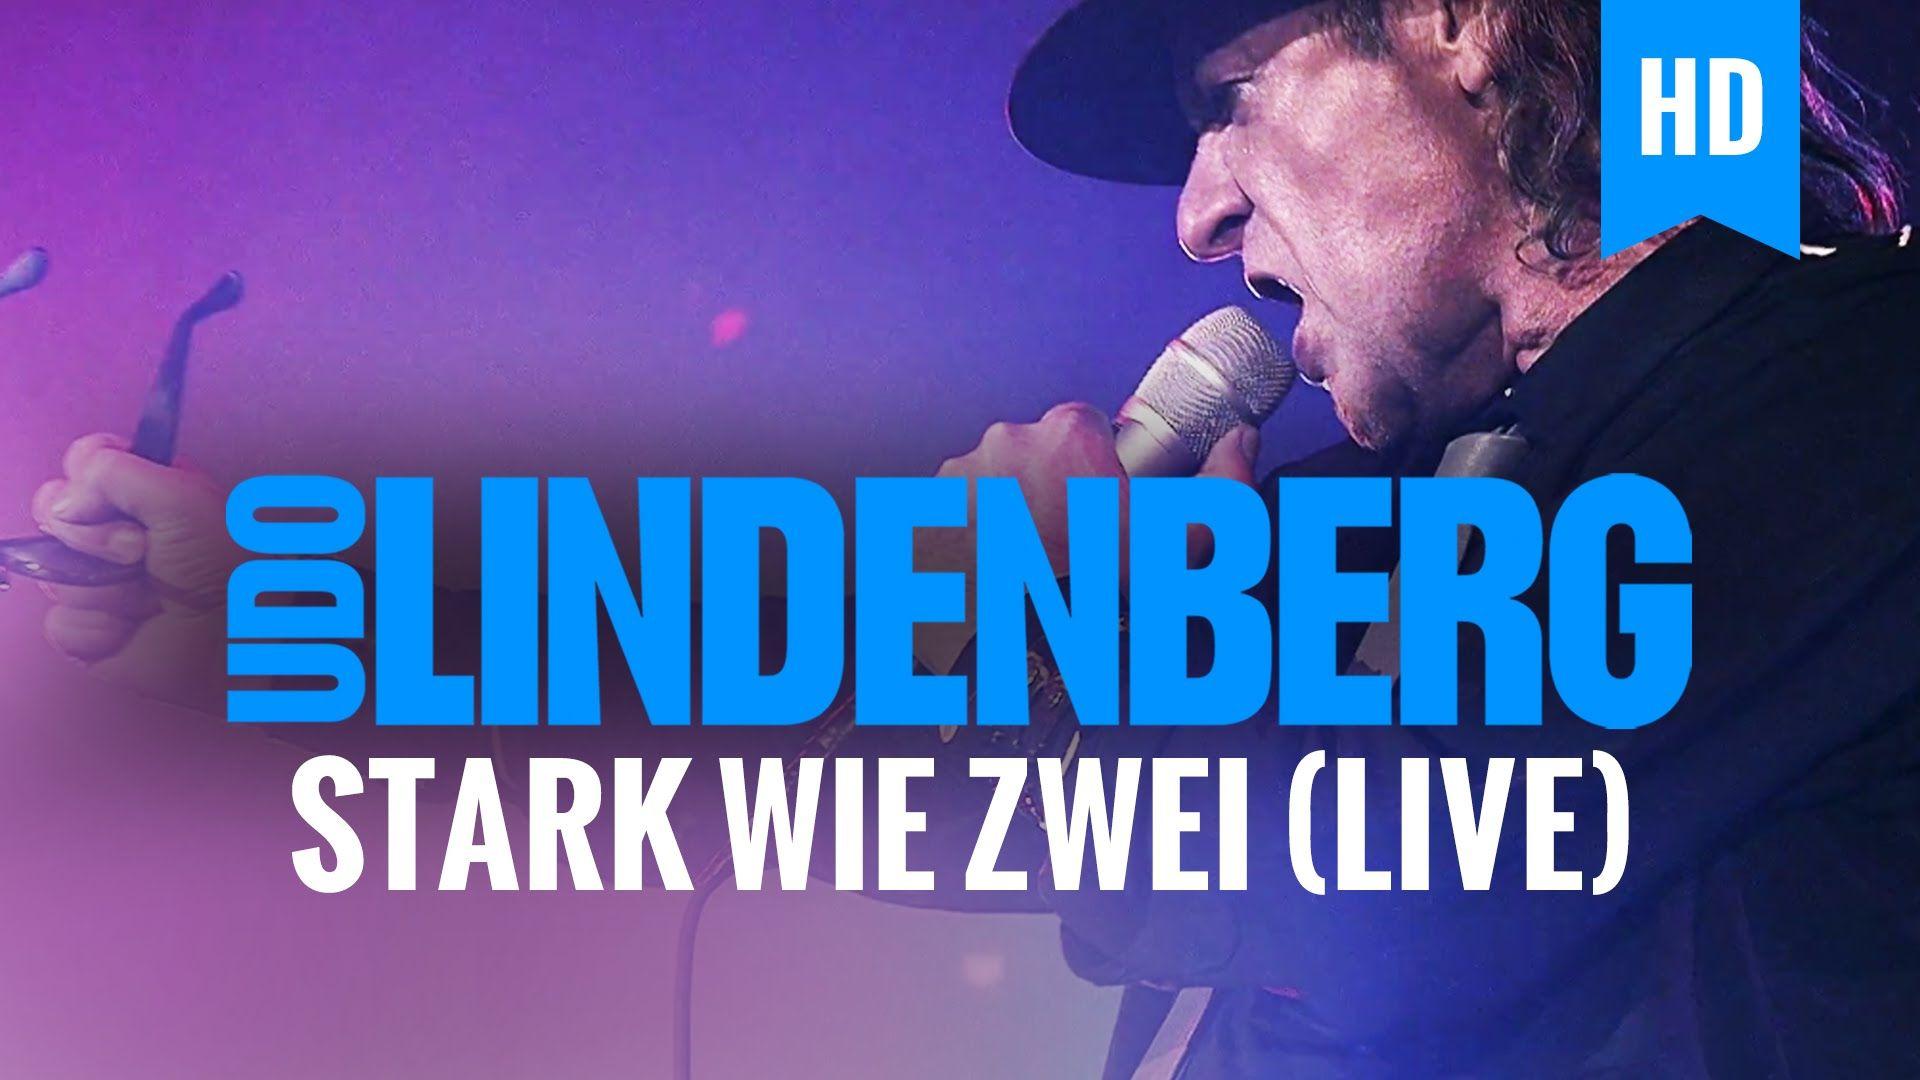 Udo Lindenberg - Stark Wie Zwei (live)